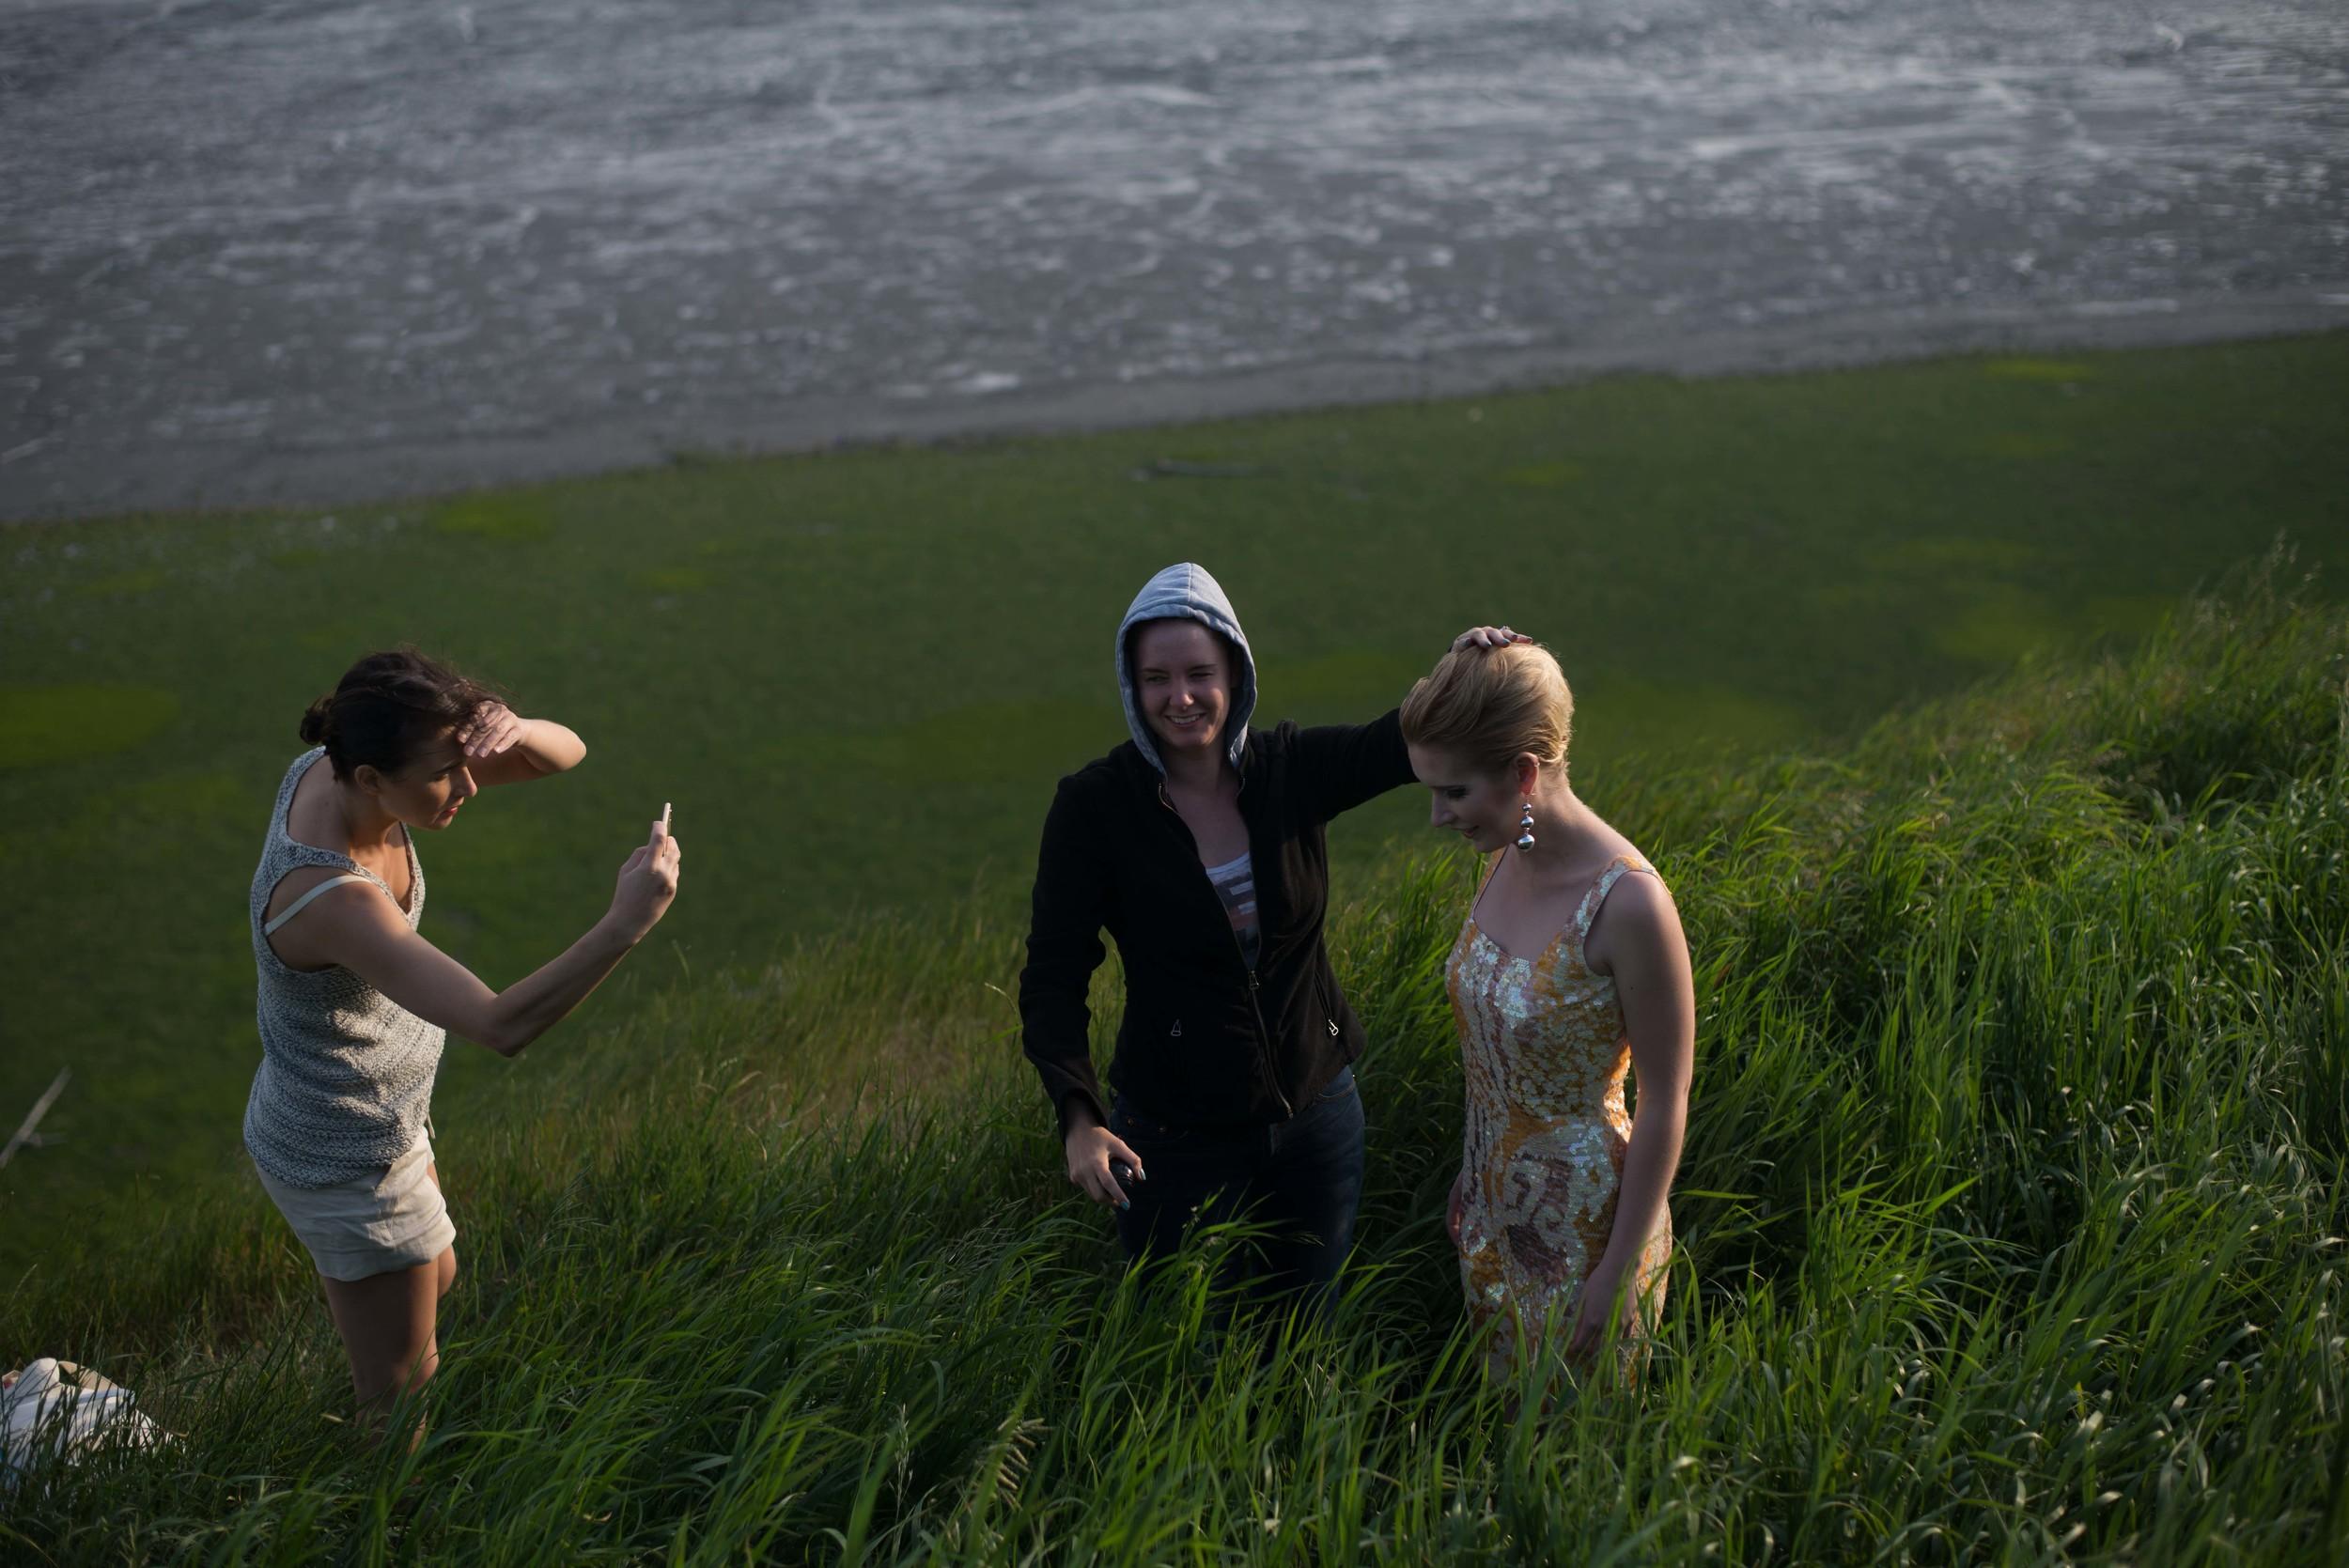 LA fashion photographer born and raised in Alaska